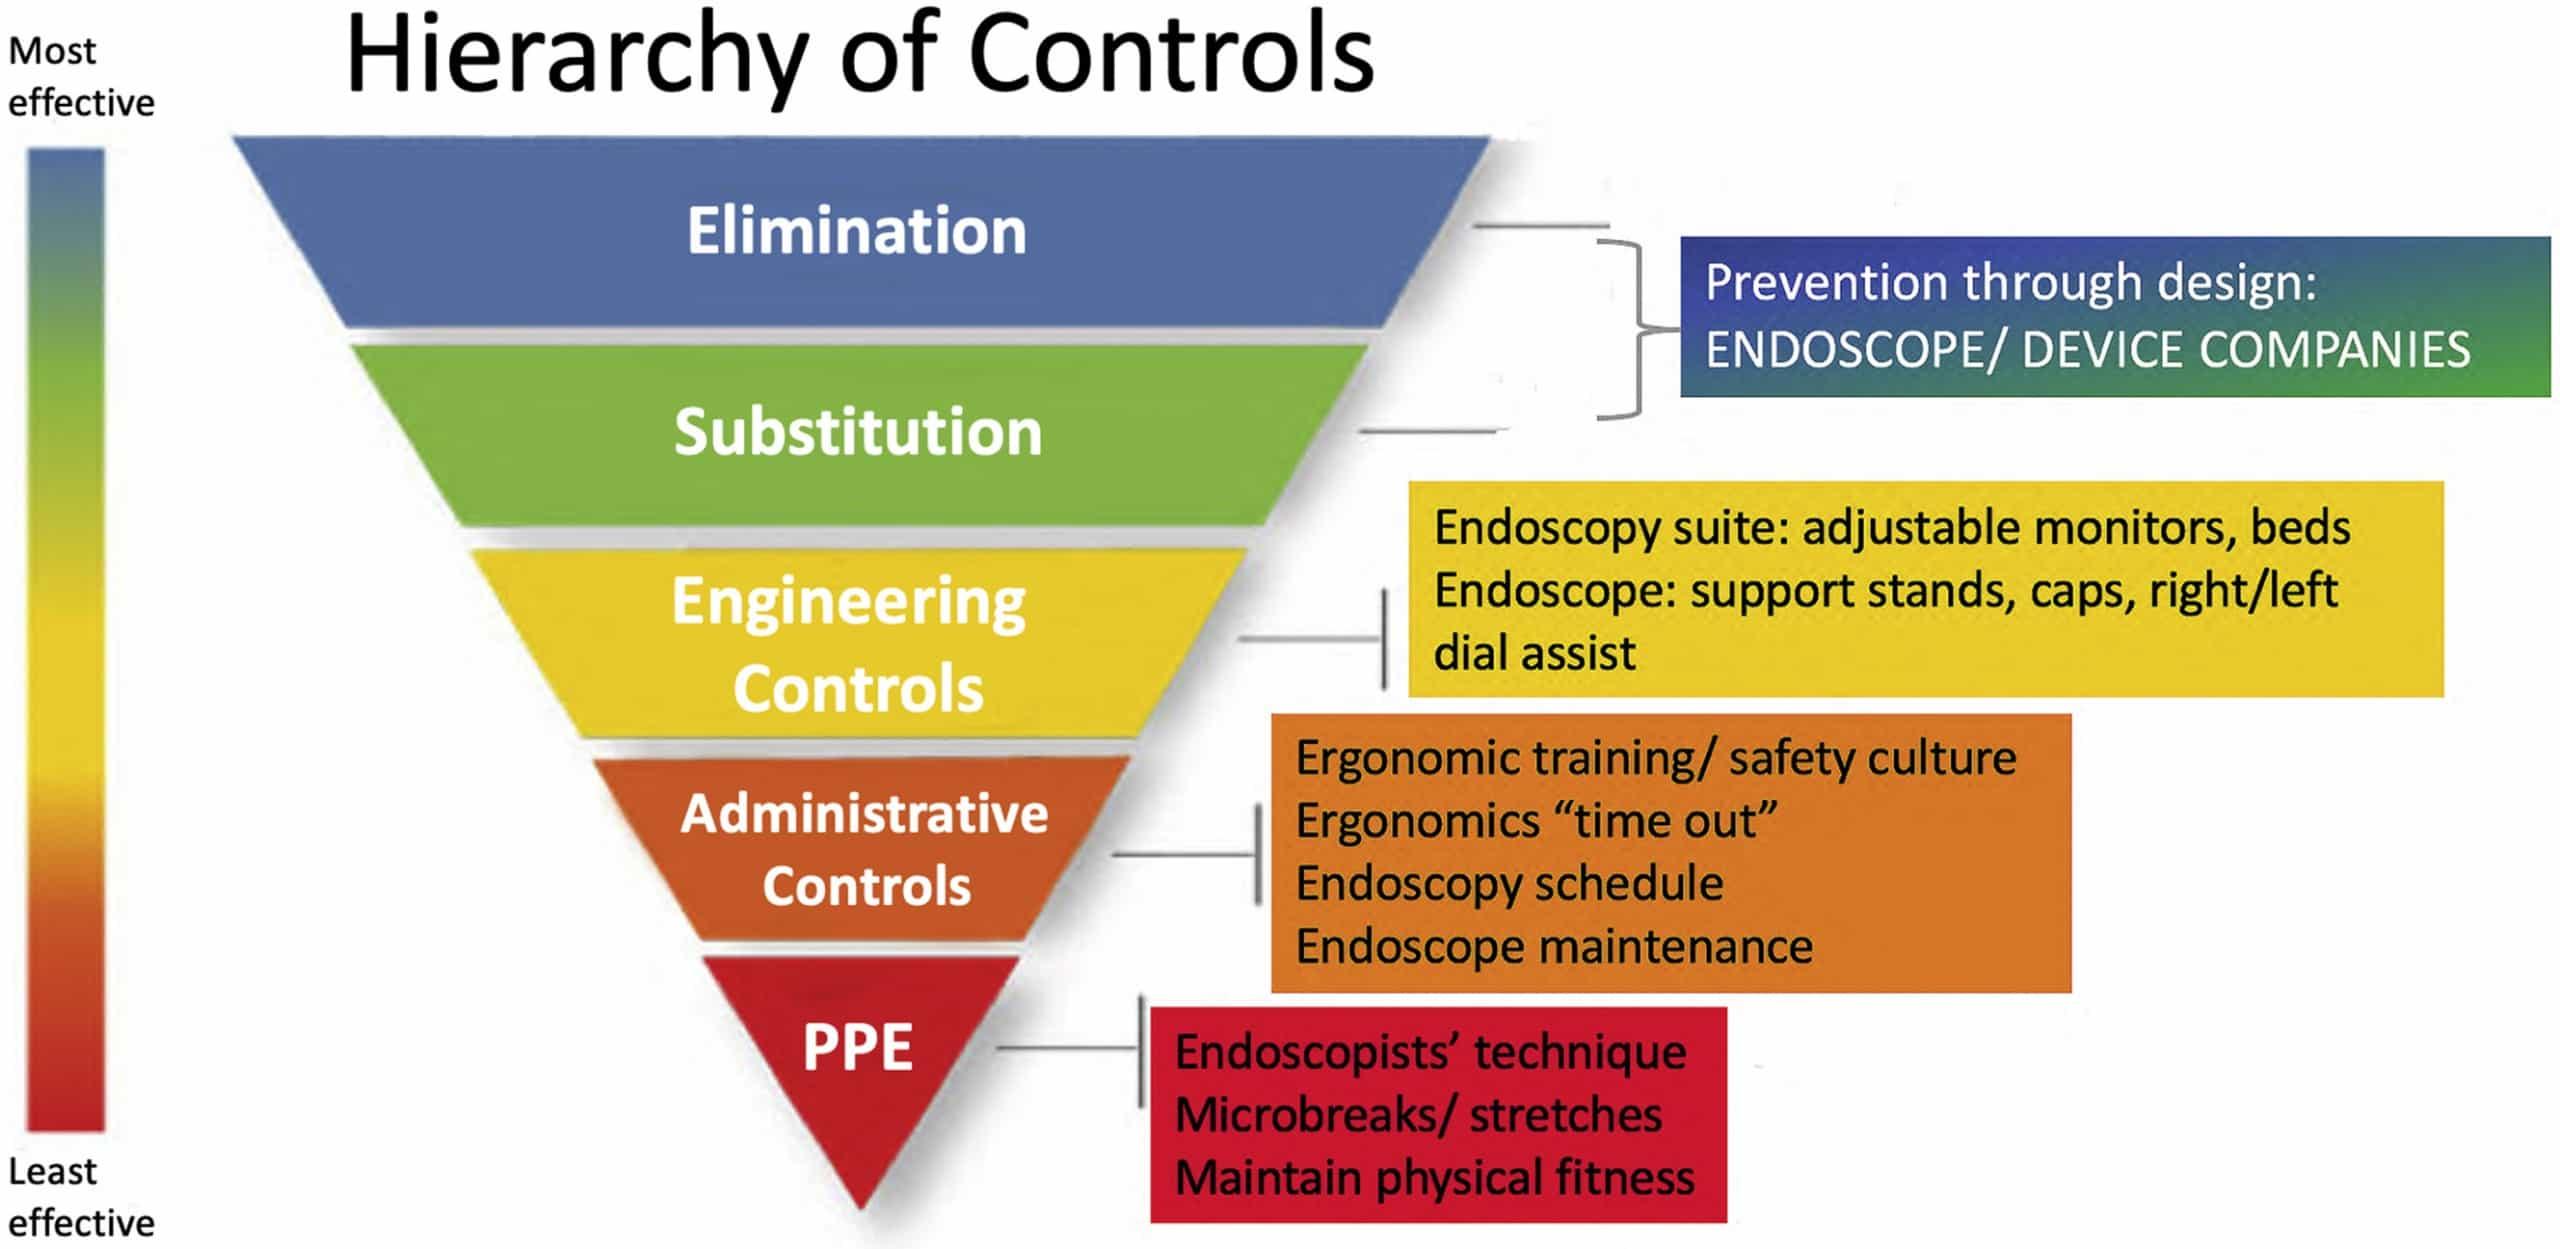 Ergonomic Endoscopy Hierarchy of Controls